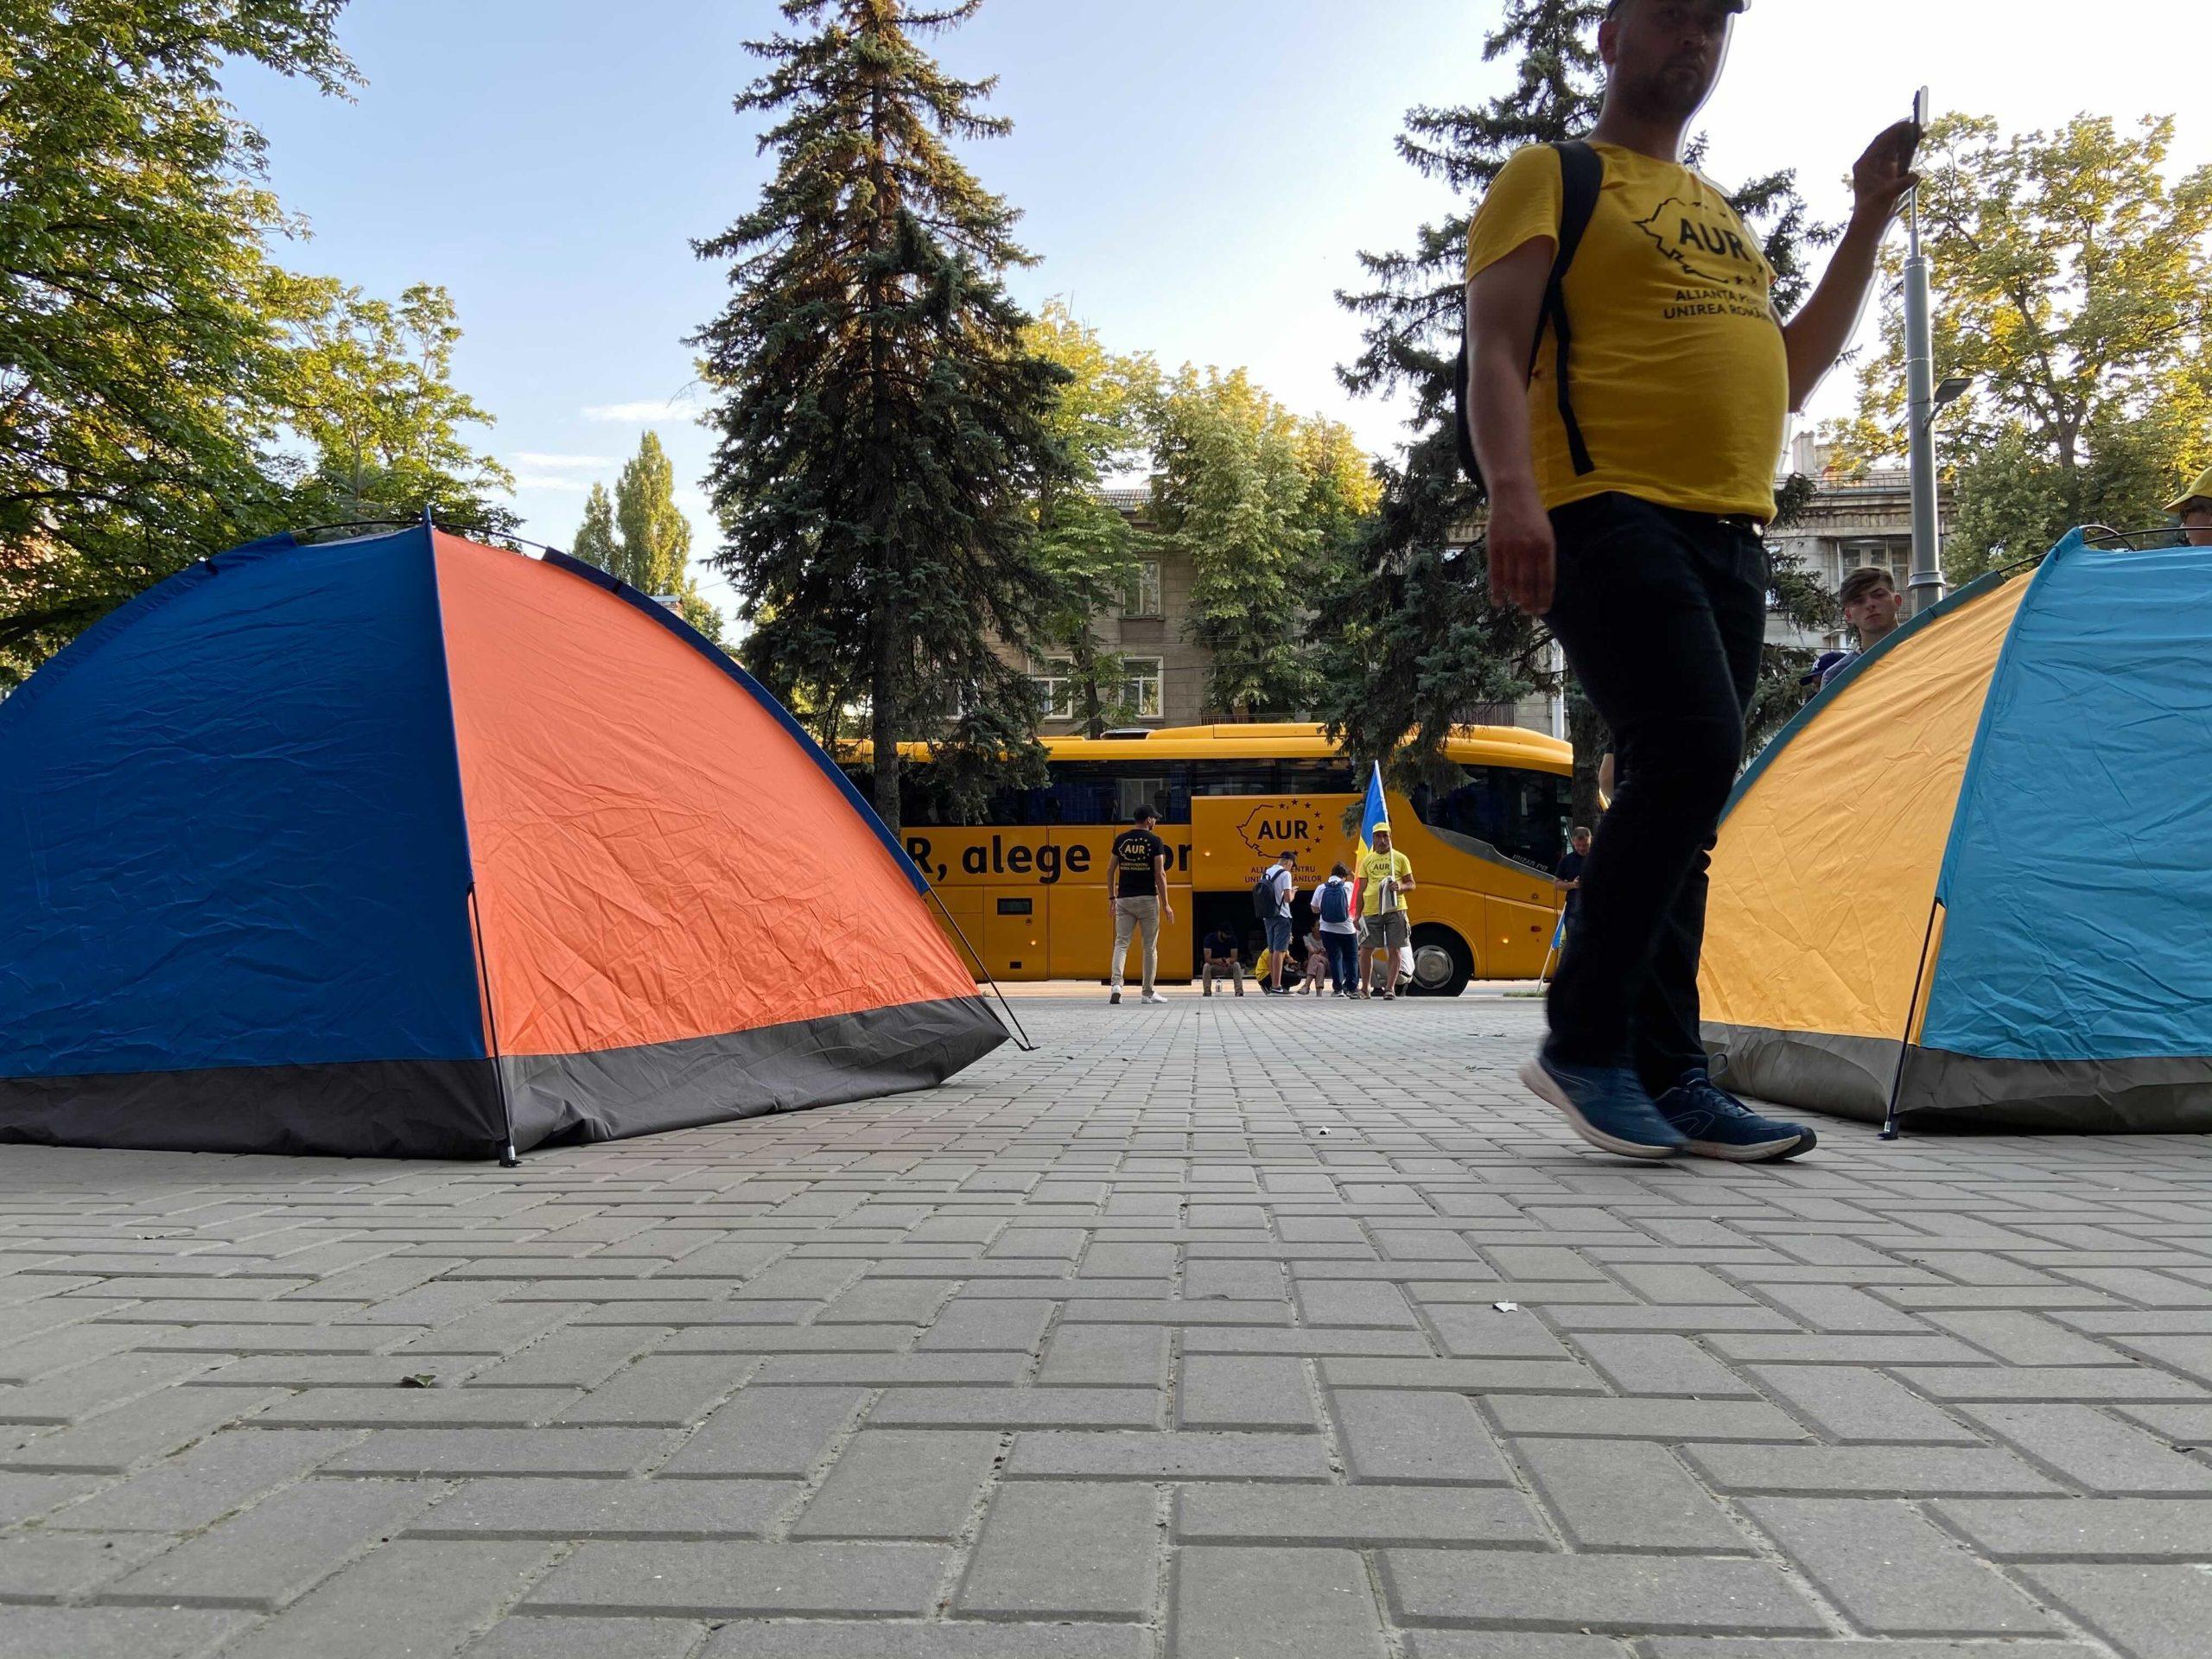 Представители AUR установили палатки уздания СИБ. Что они требуют? (ФОТО)